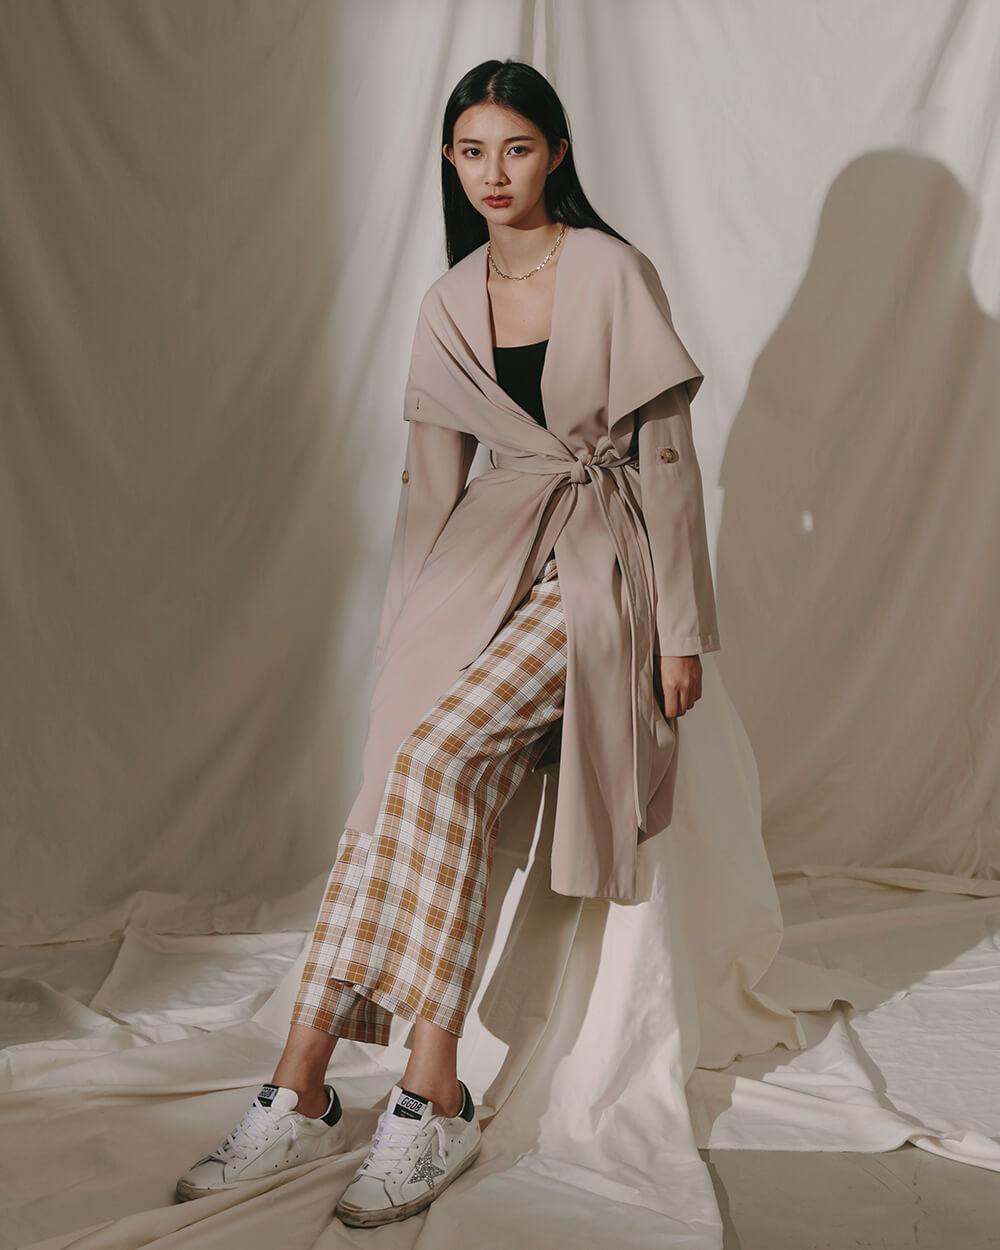 Buy Now, Wear Now : Outerwear